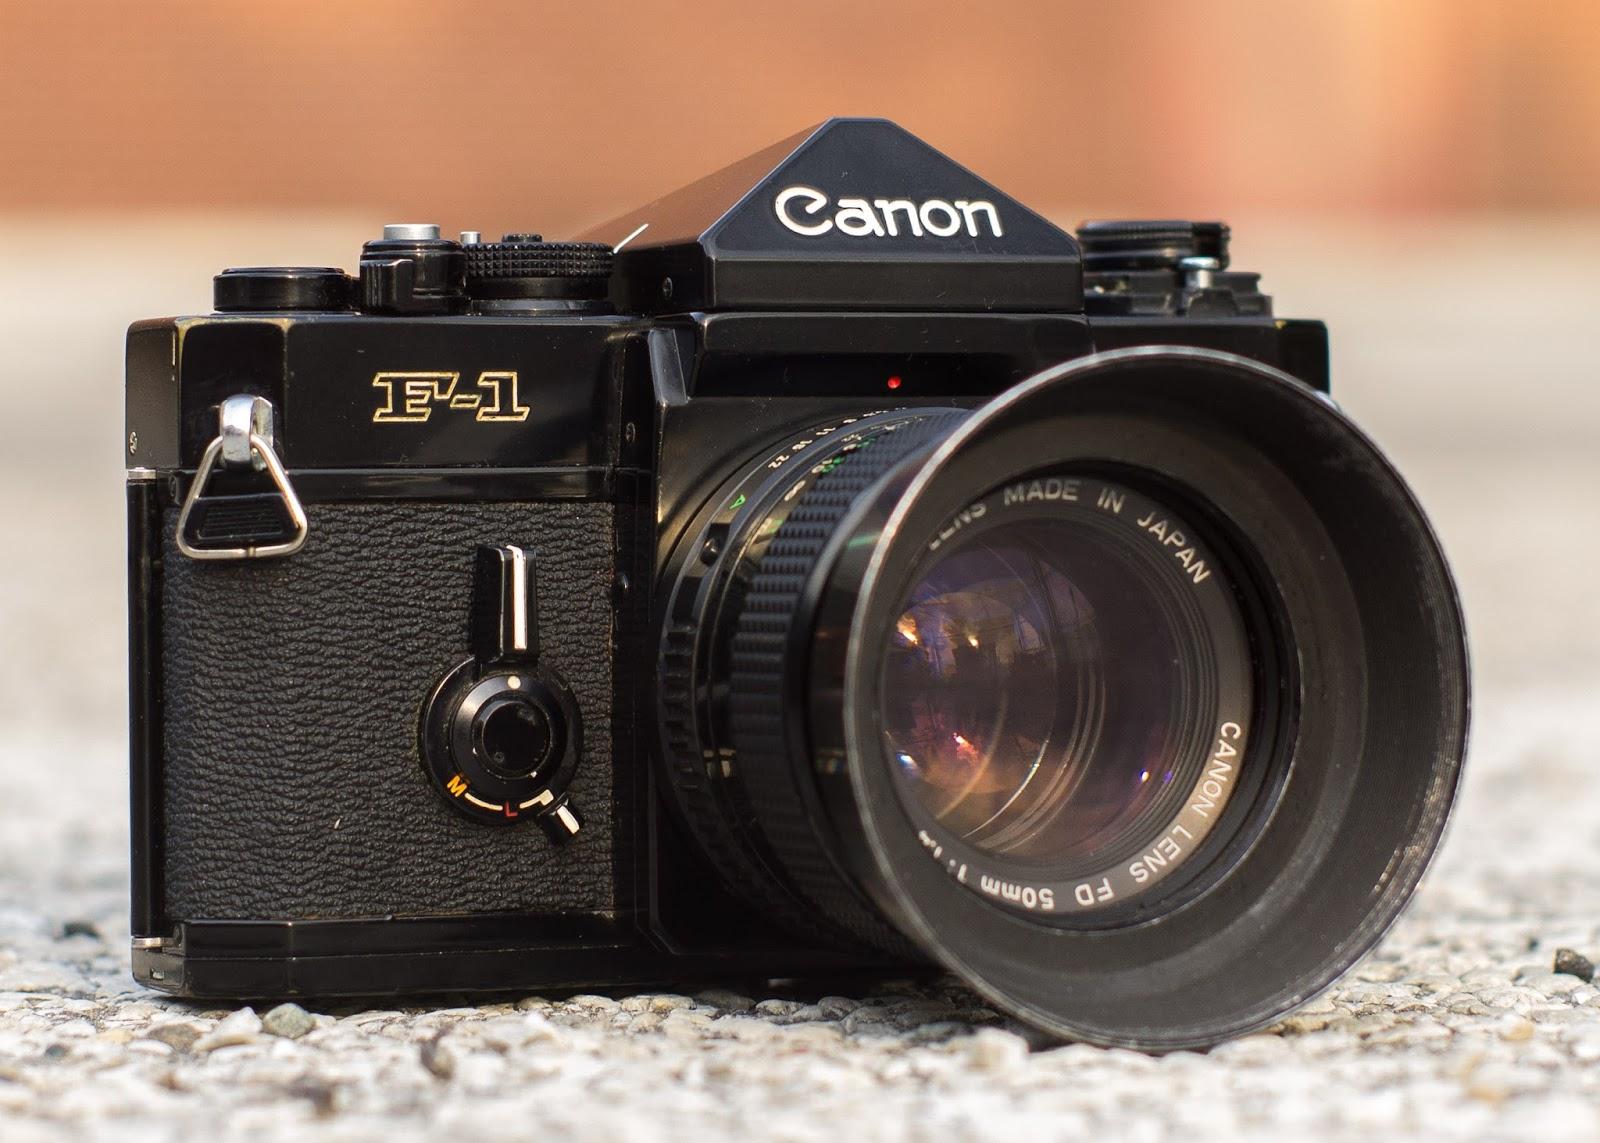 Minolta Sr-t 100 35mm Slr Film Camera With Multi-coated Rokkor ...